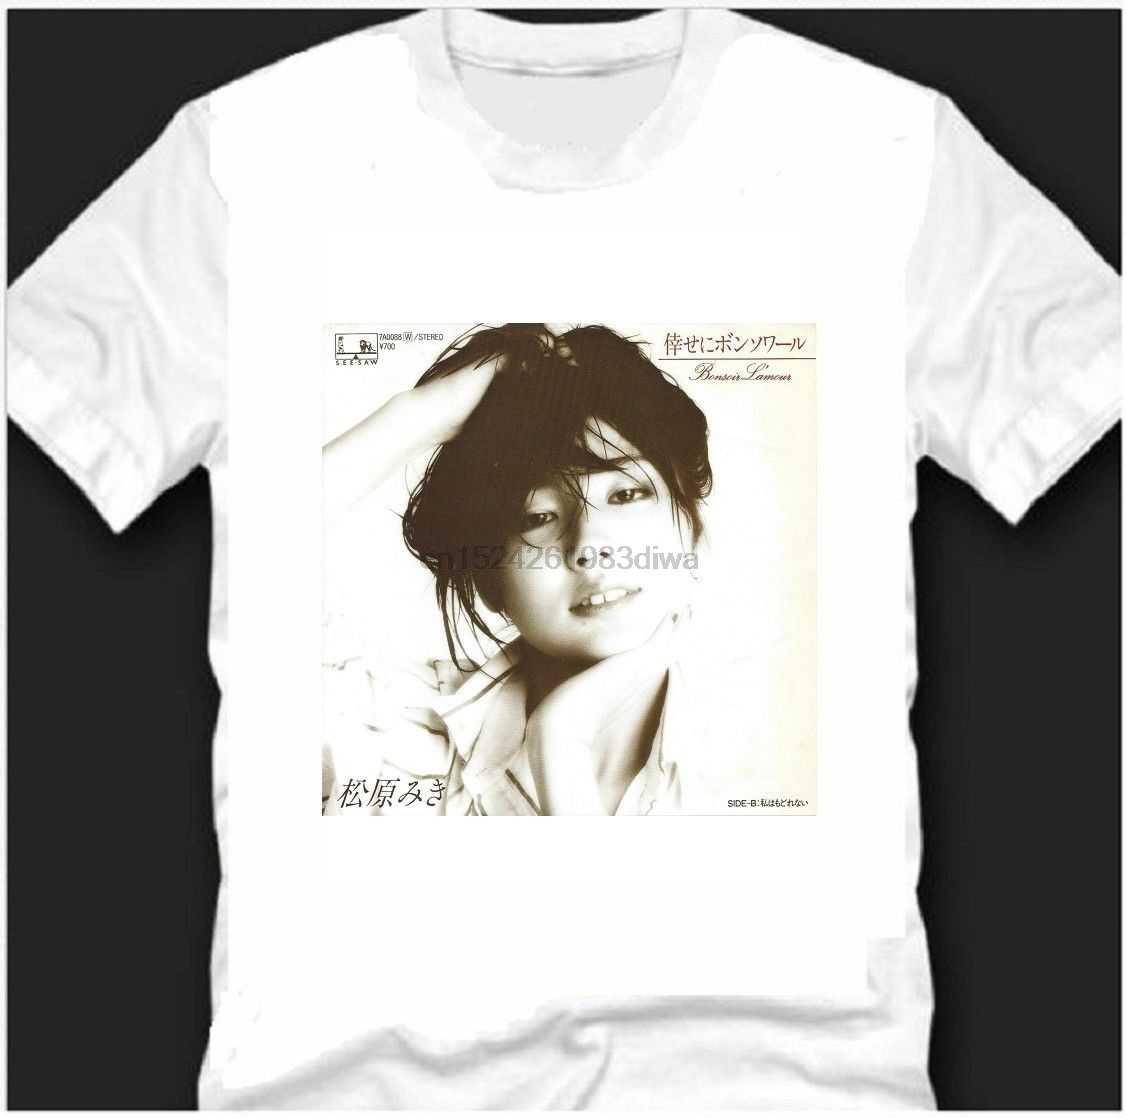 Vaporwave Me Matsubara Japan T Stay Japanese Miki City Shirt Pop With Jpop vOm0nN8w